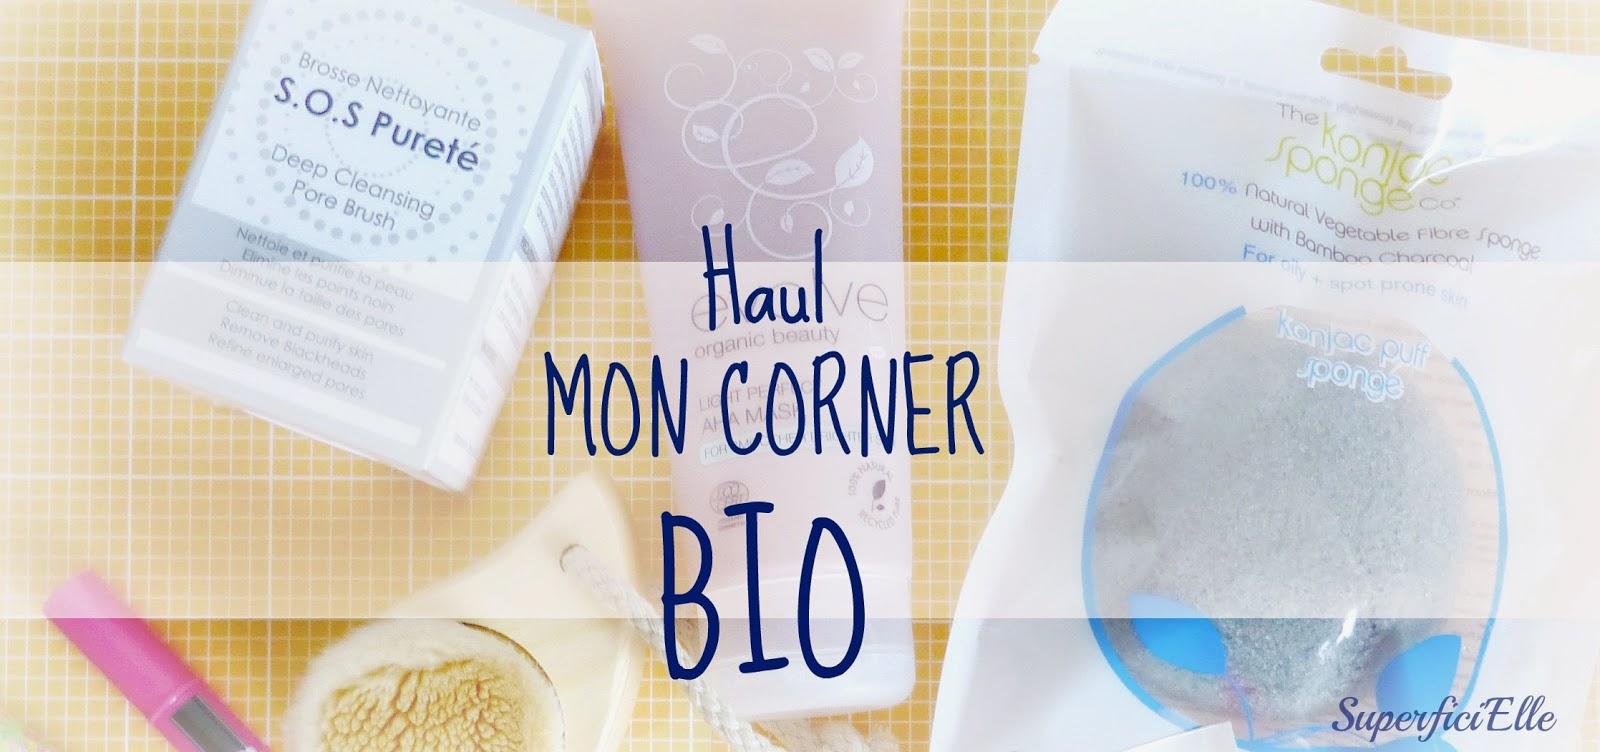 Haul Mon Corner Bio - Nettoyer et illuminer